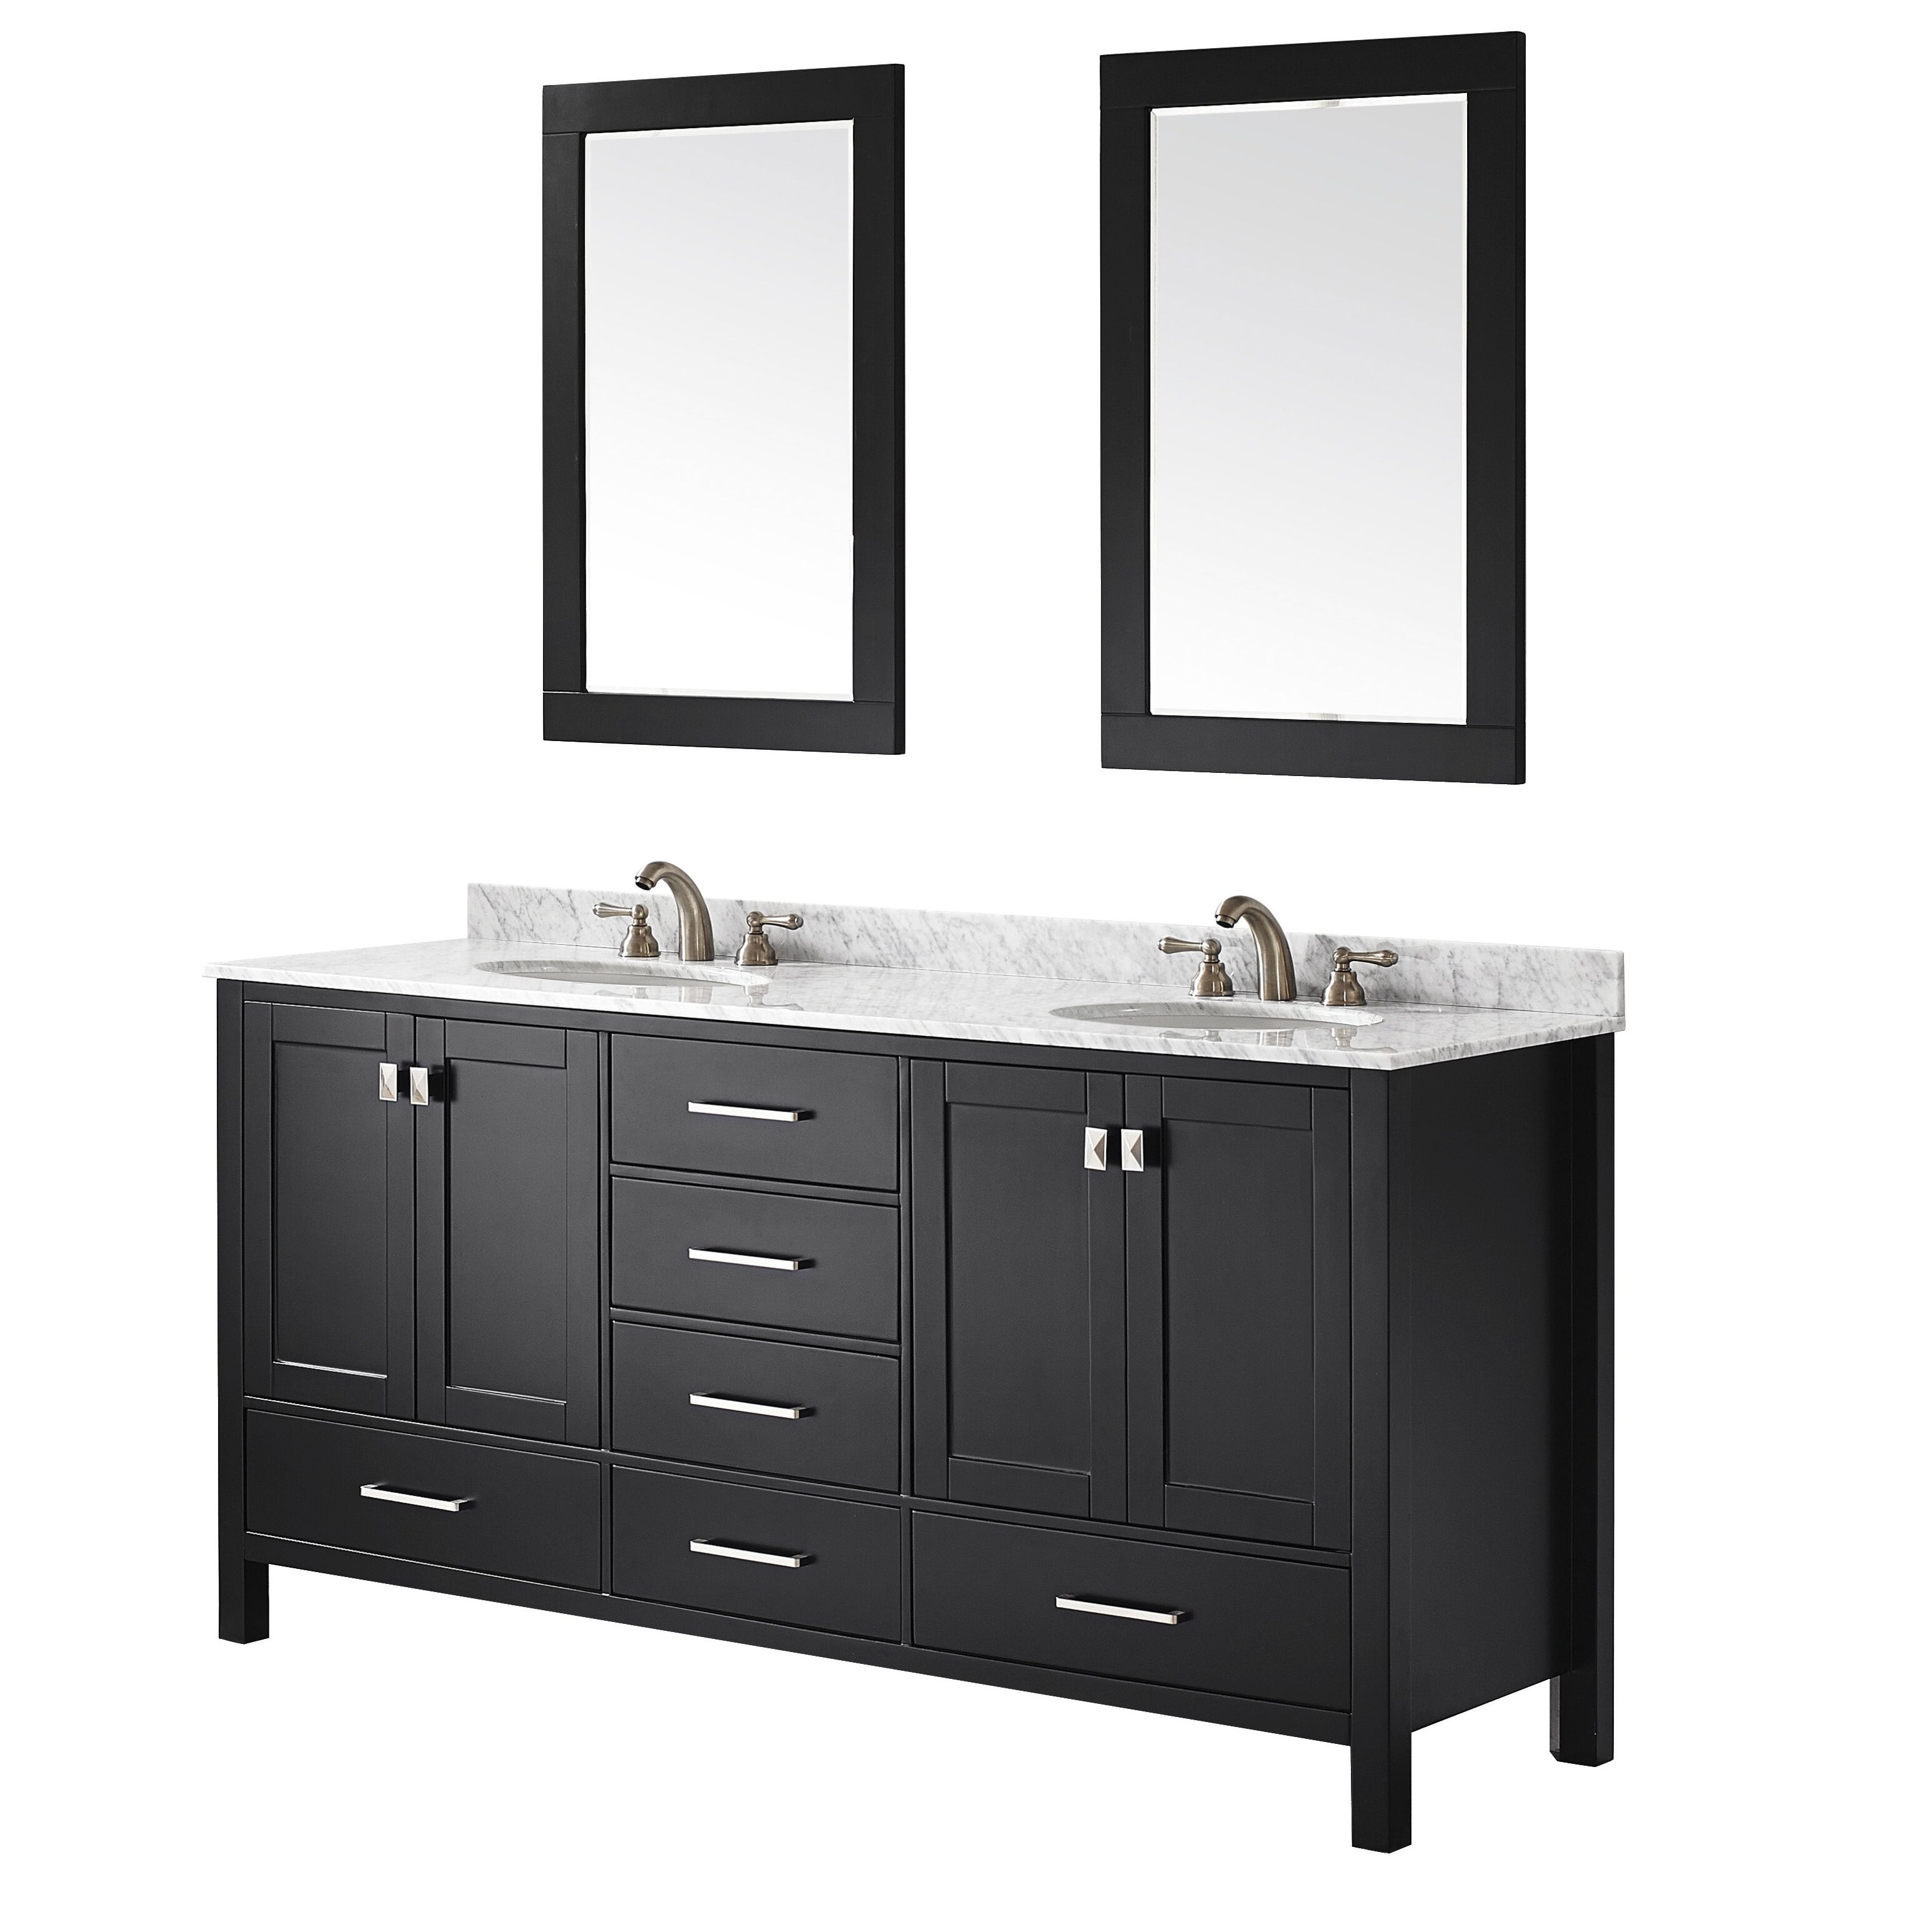 vanity sets design style industry standard bathroom mirror cabinets alluring bathroom sink vanity cabinet